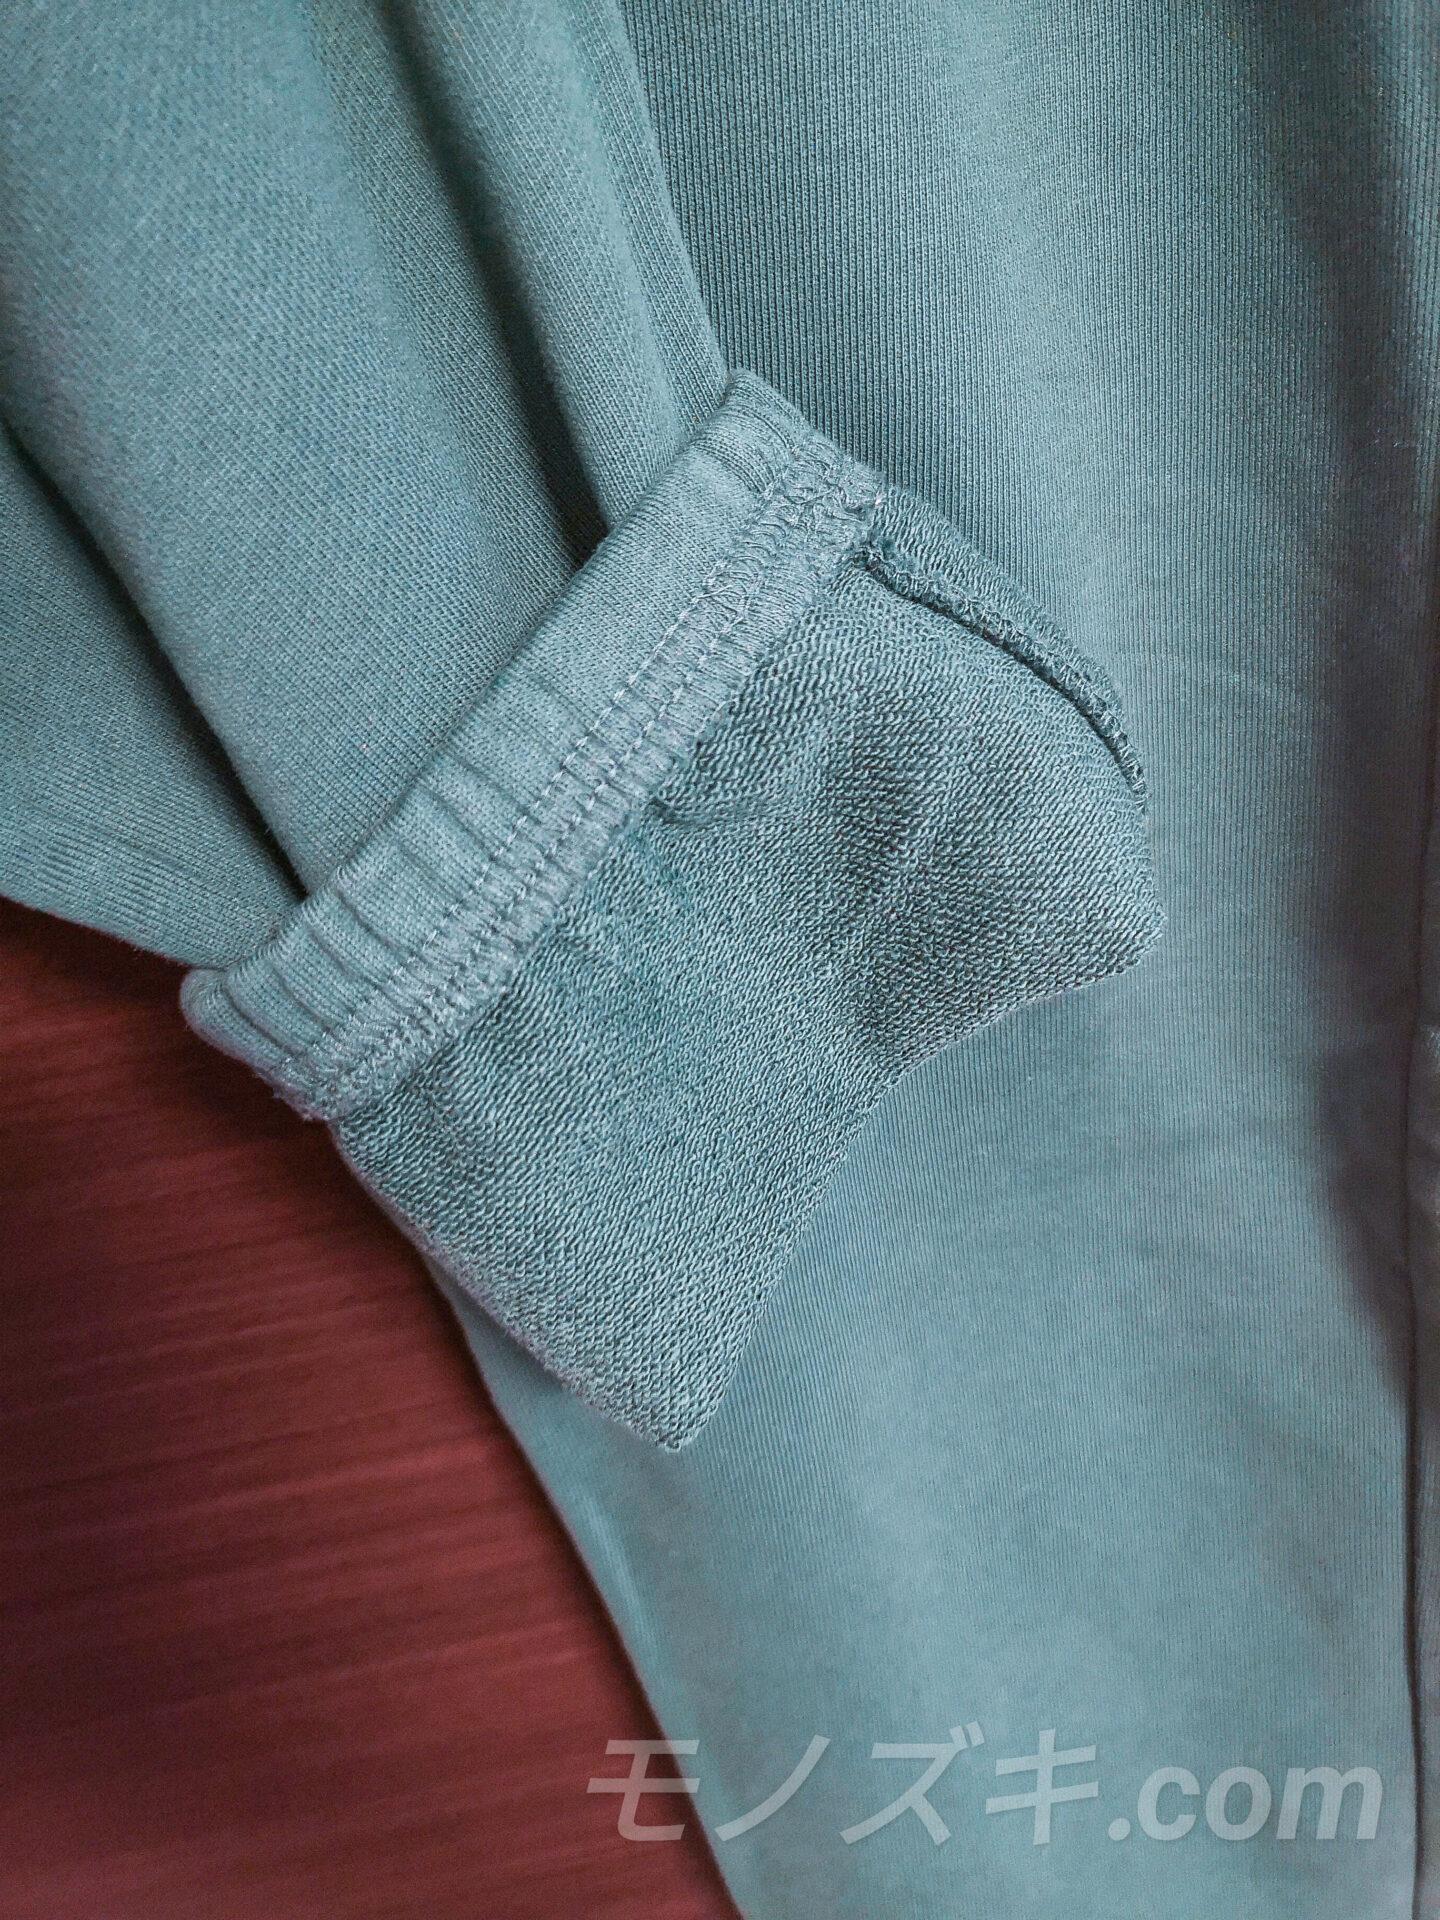 H&M Blank Staples グリーン スウェットパンツ 裏毛